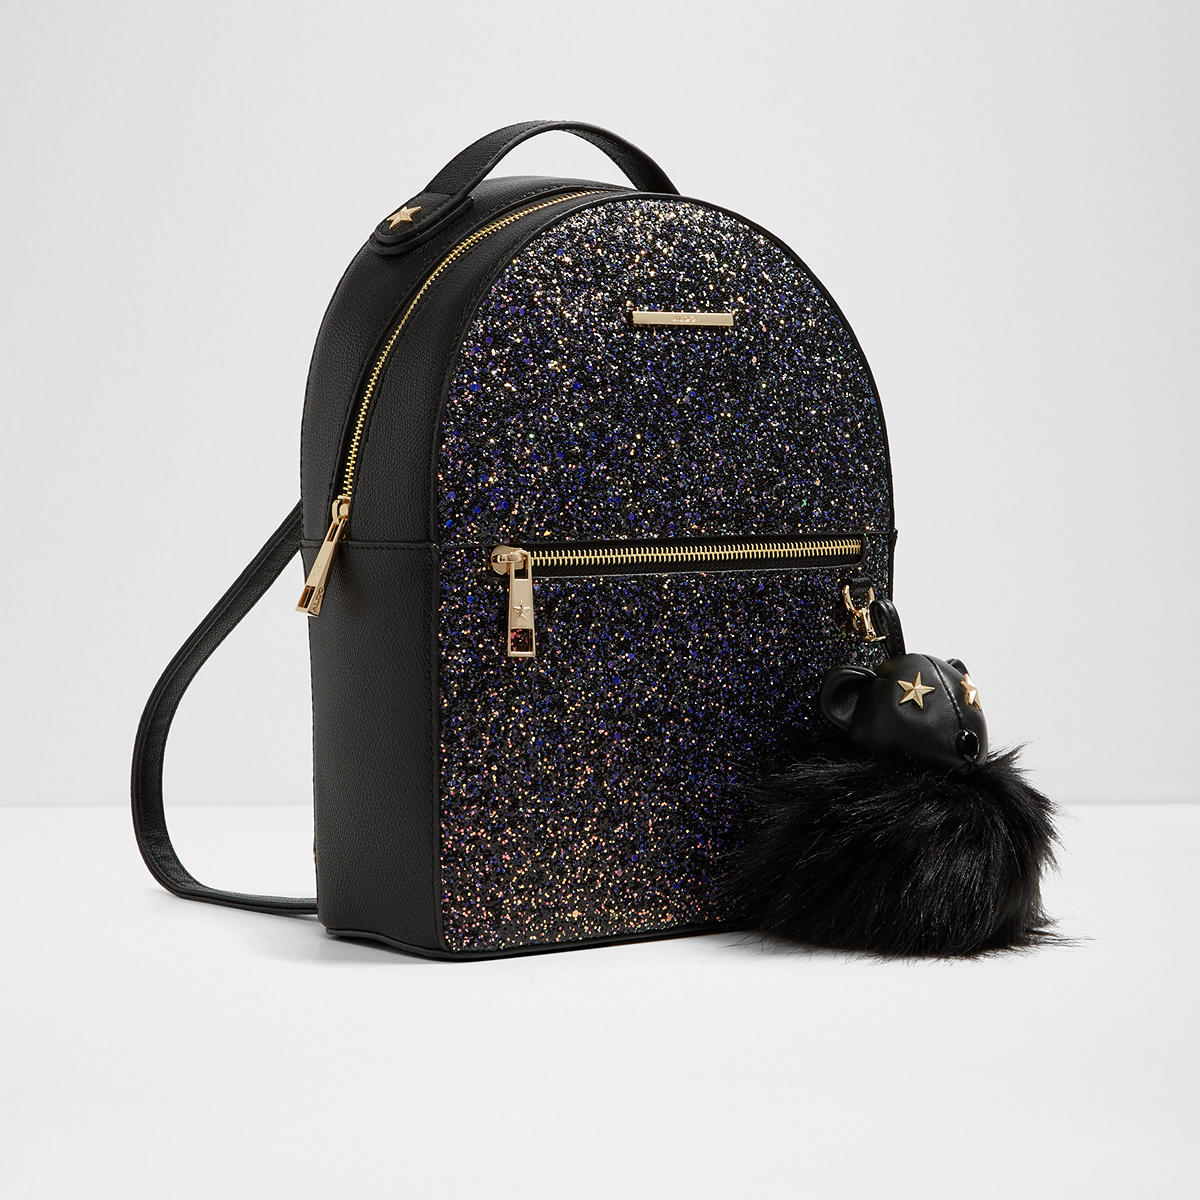 1015079b2eaa Adraolla Black Multi Women s Backpacks